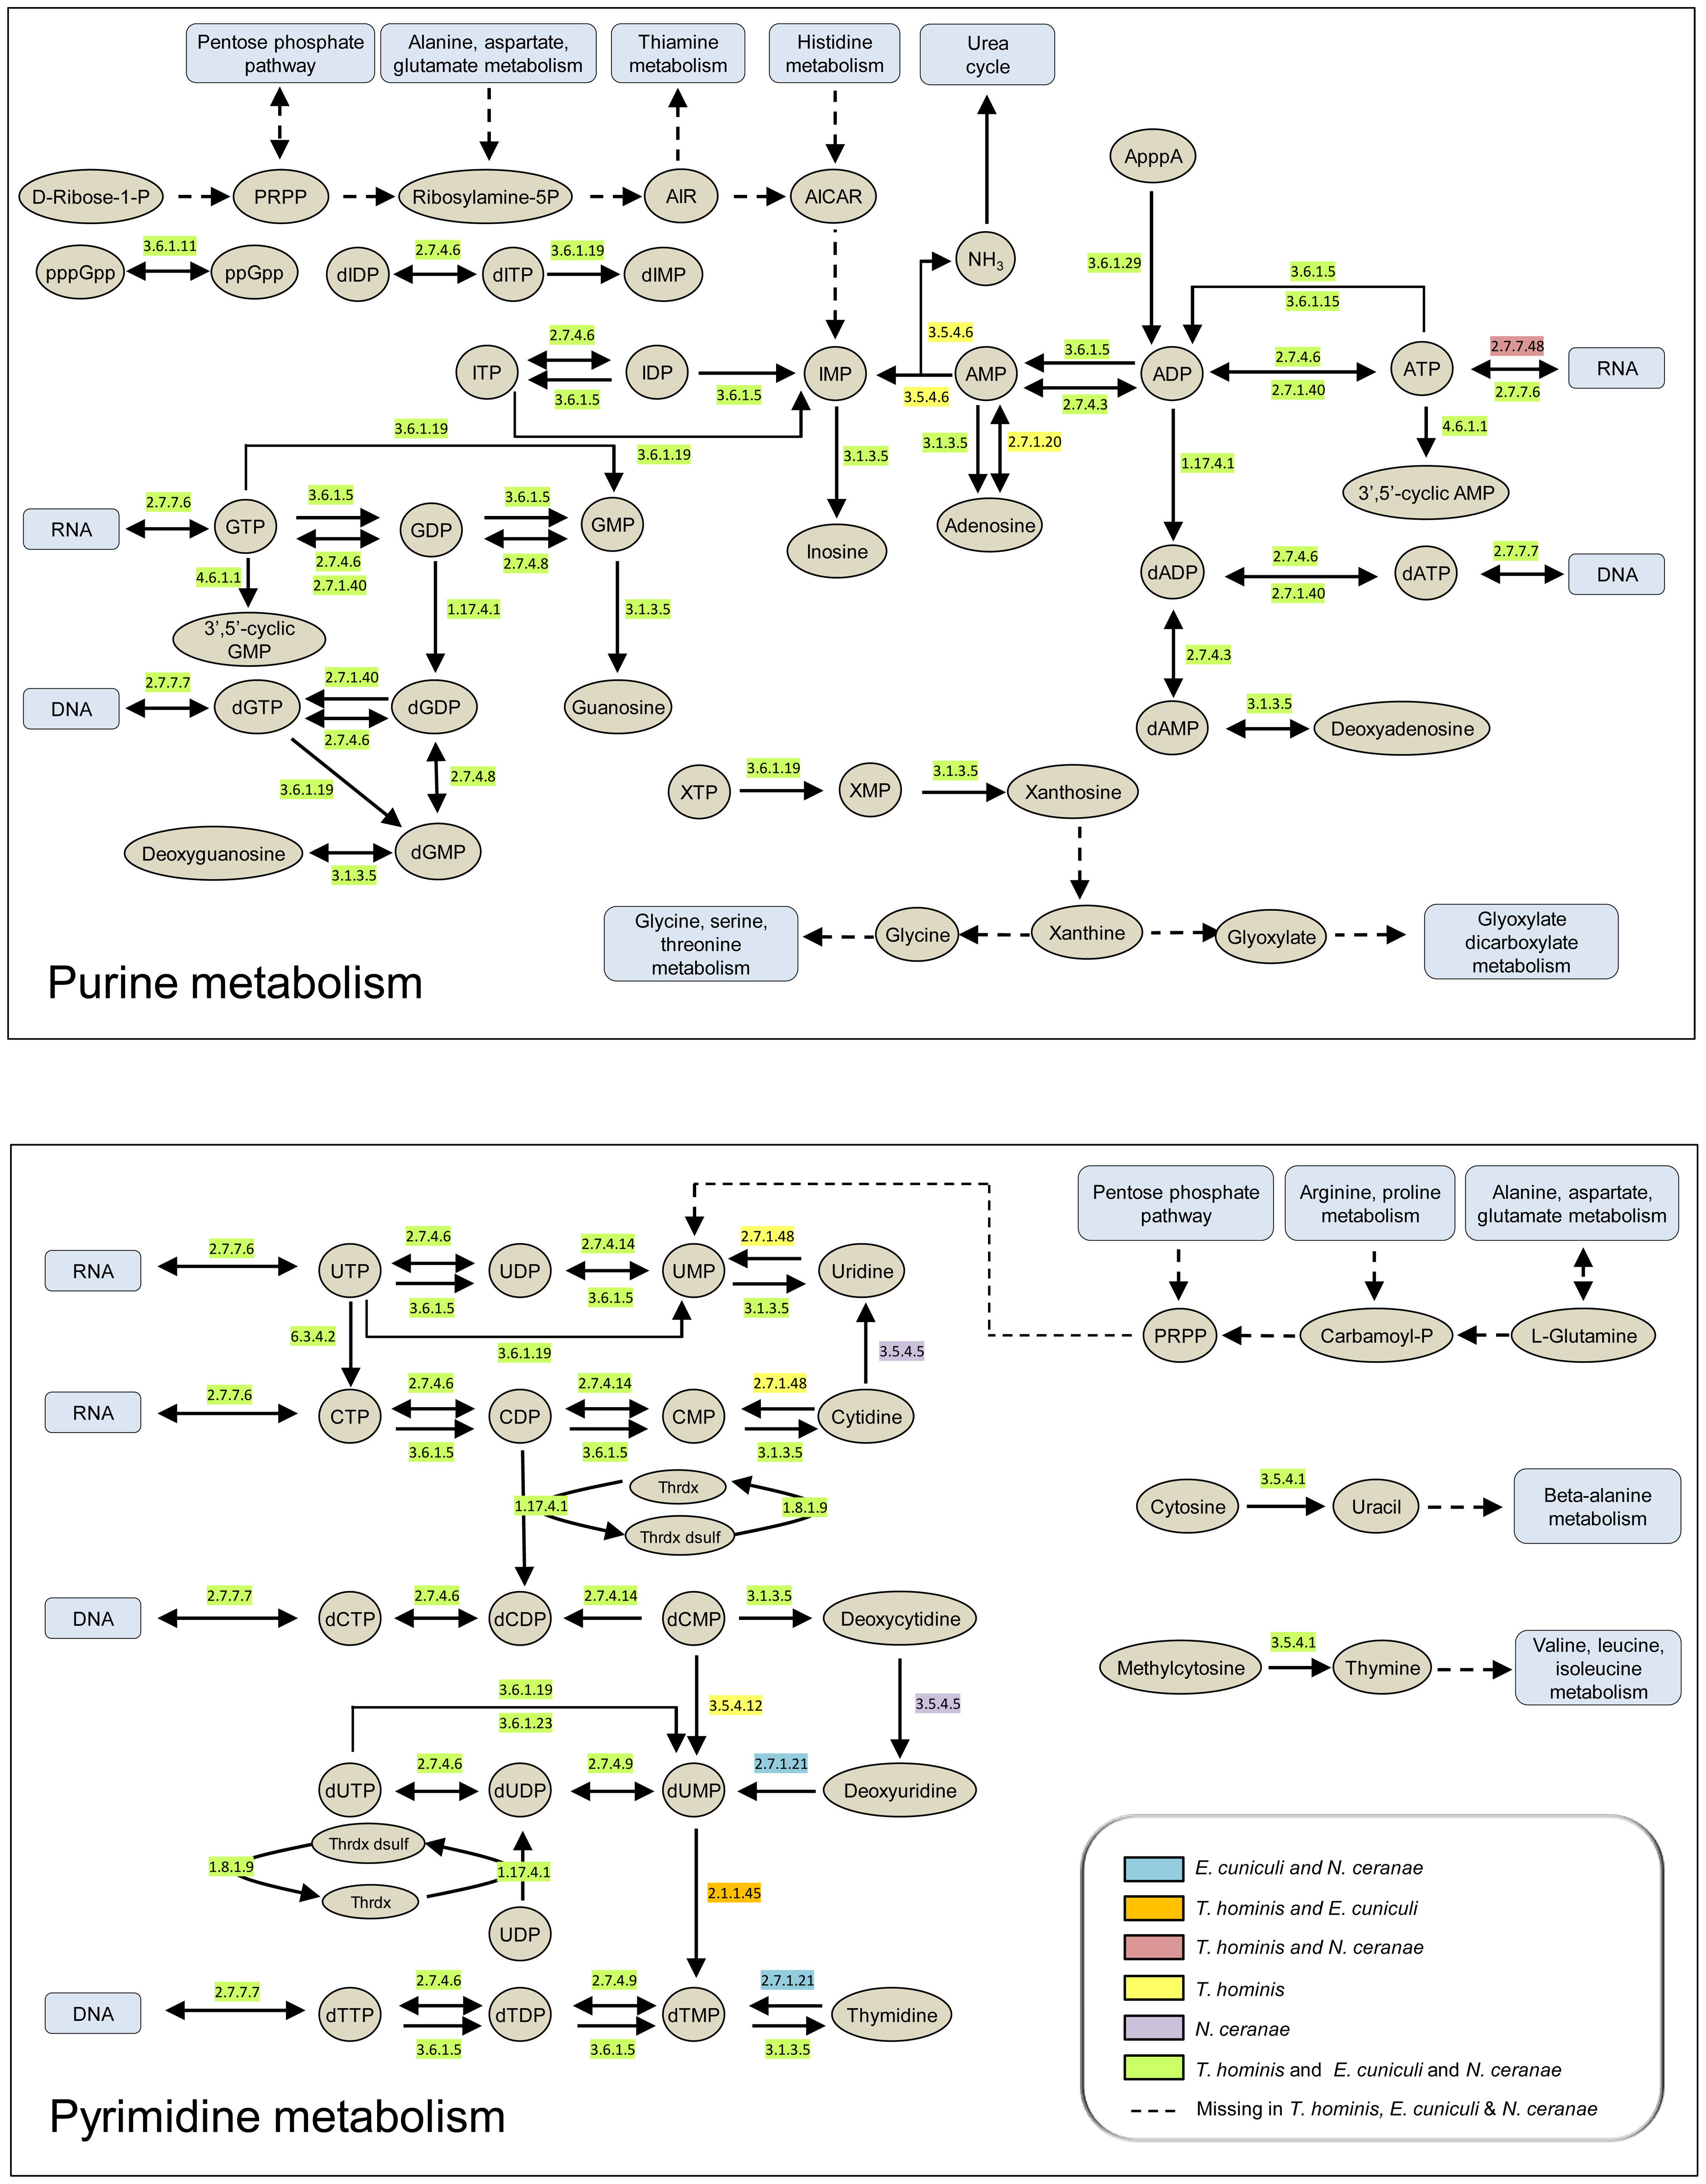 Purine and pyrimidine metabolism in <i>Encepthalitozoon cuniculi, Nosema ceranae</i> and <i>Trachipleistophora hominis</i>.